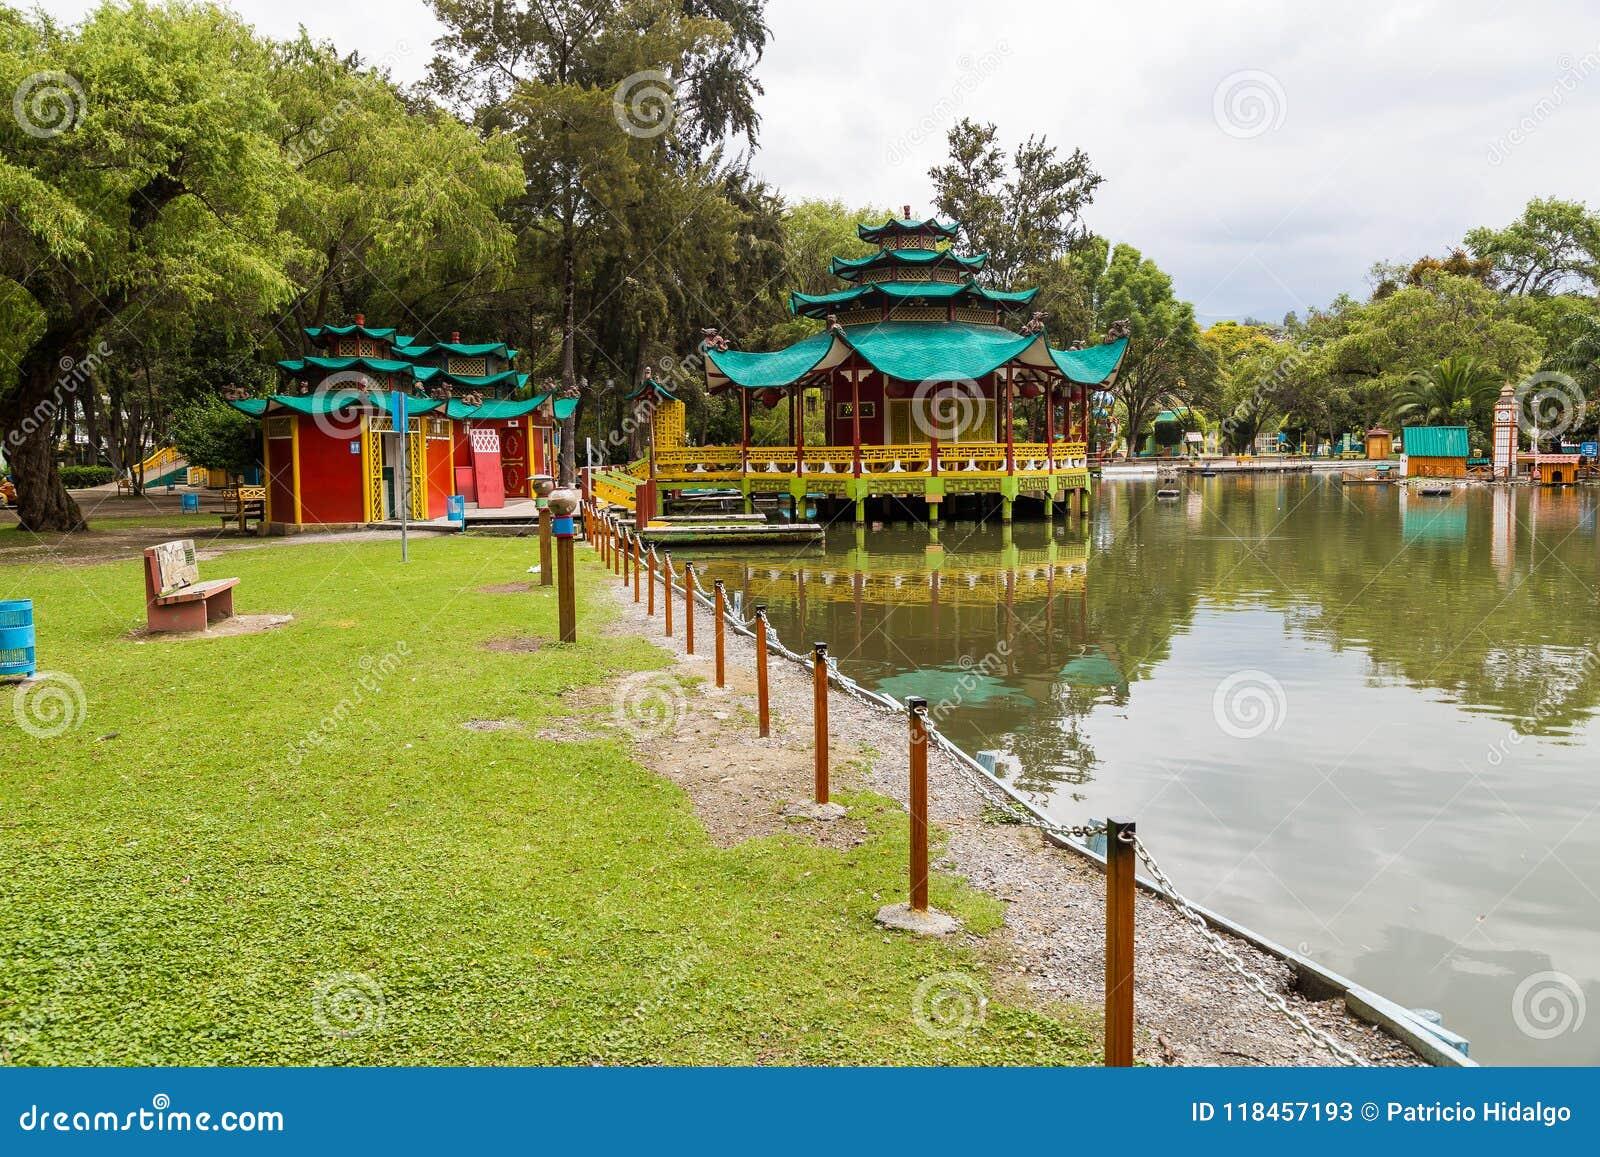 thematic corners in jipiro park editorial stock photo image of